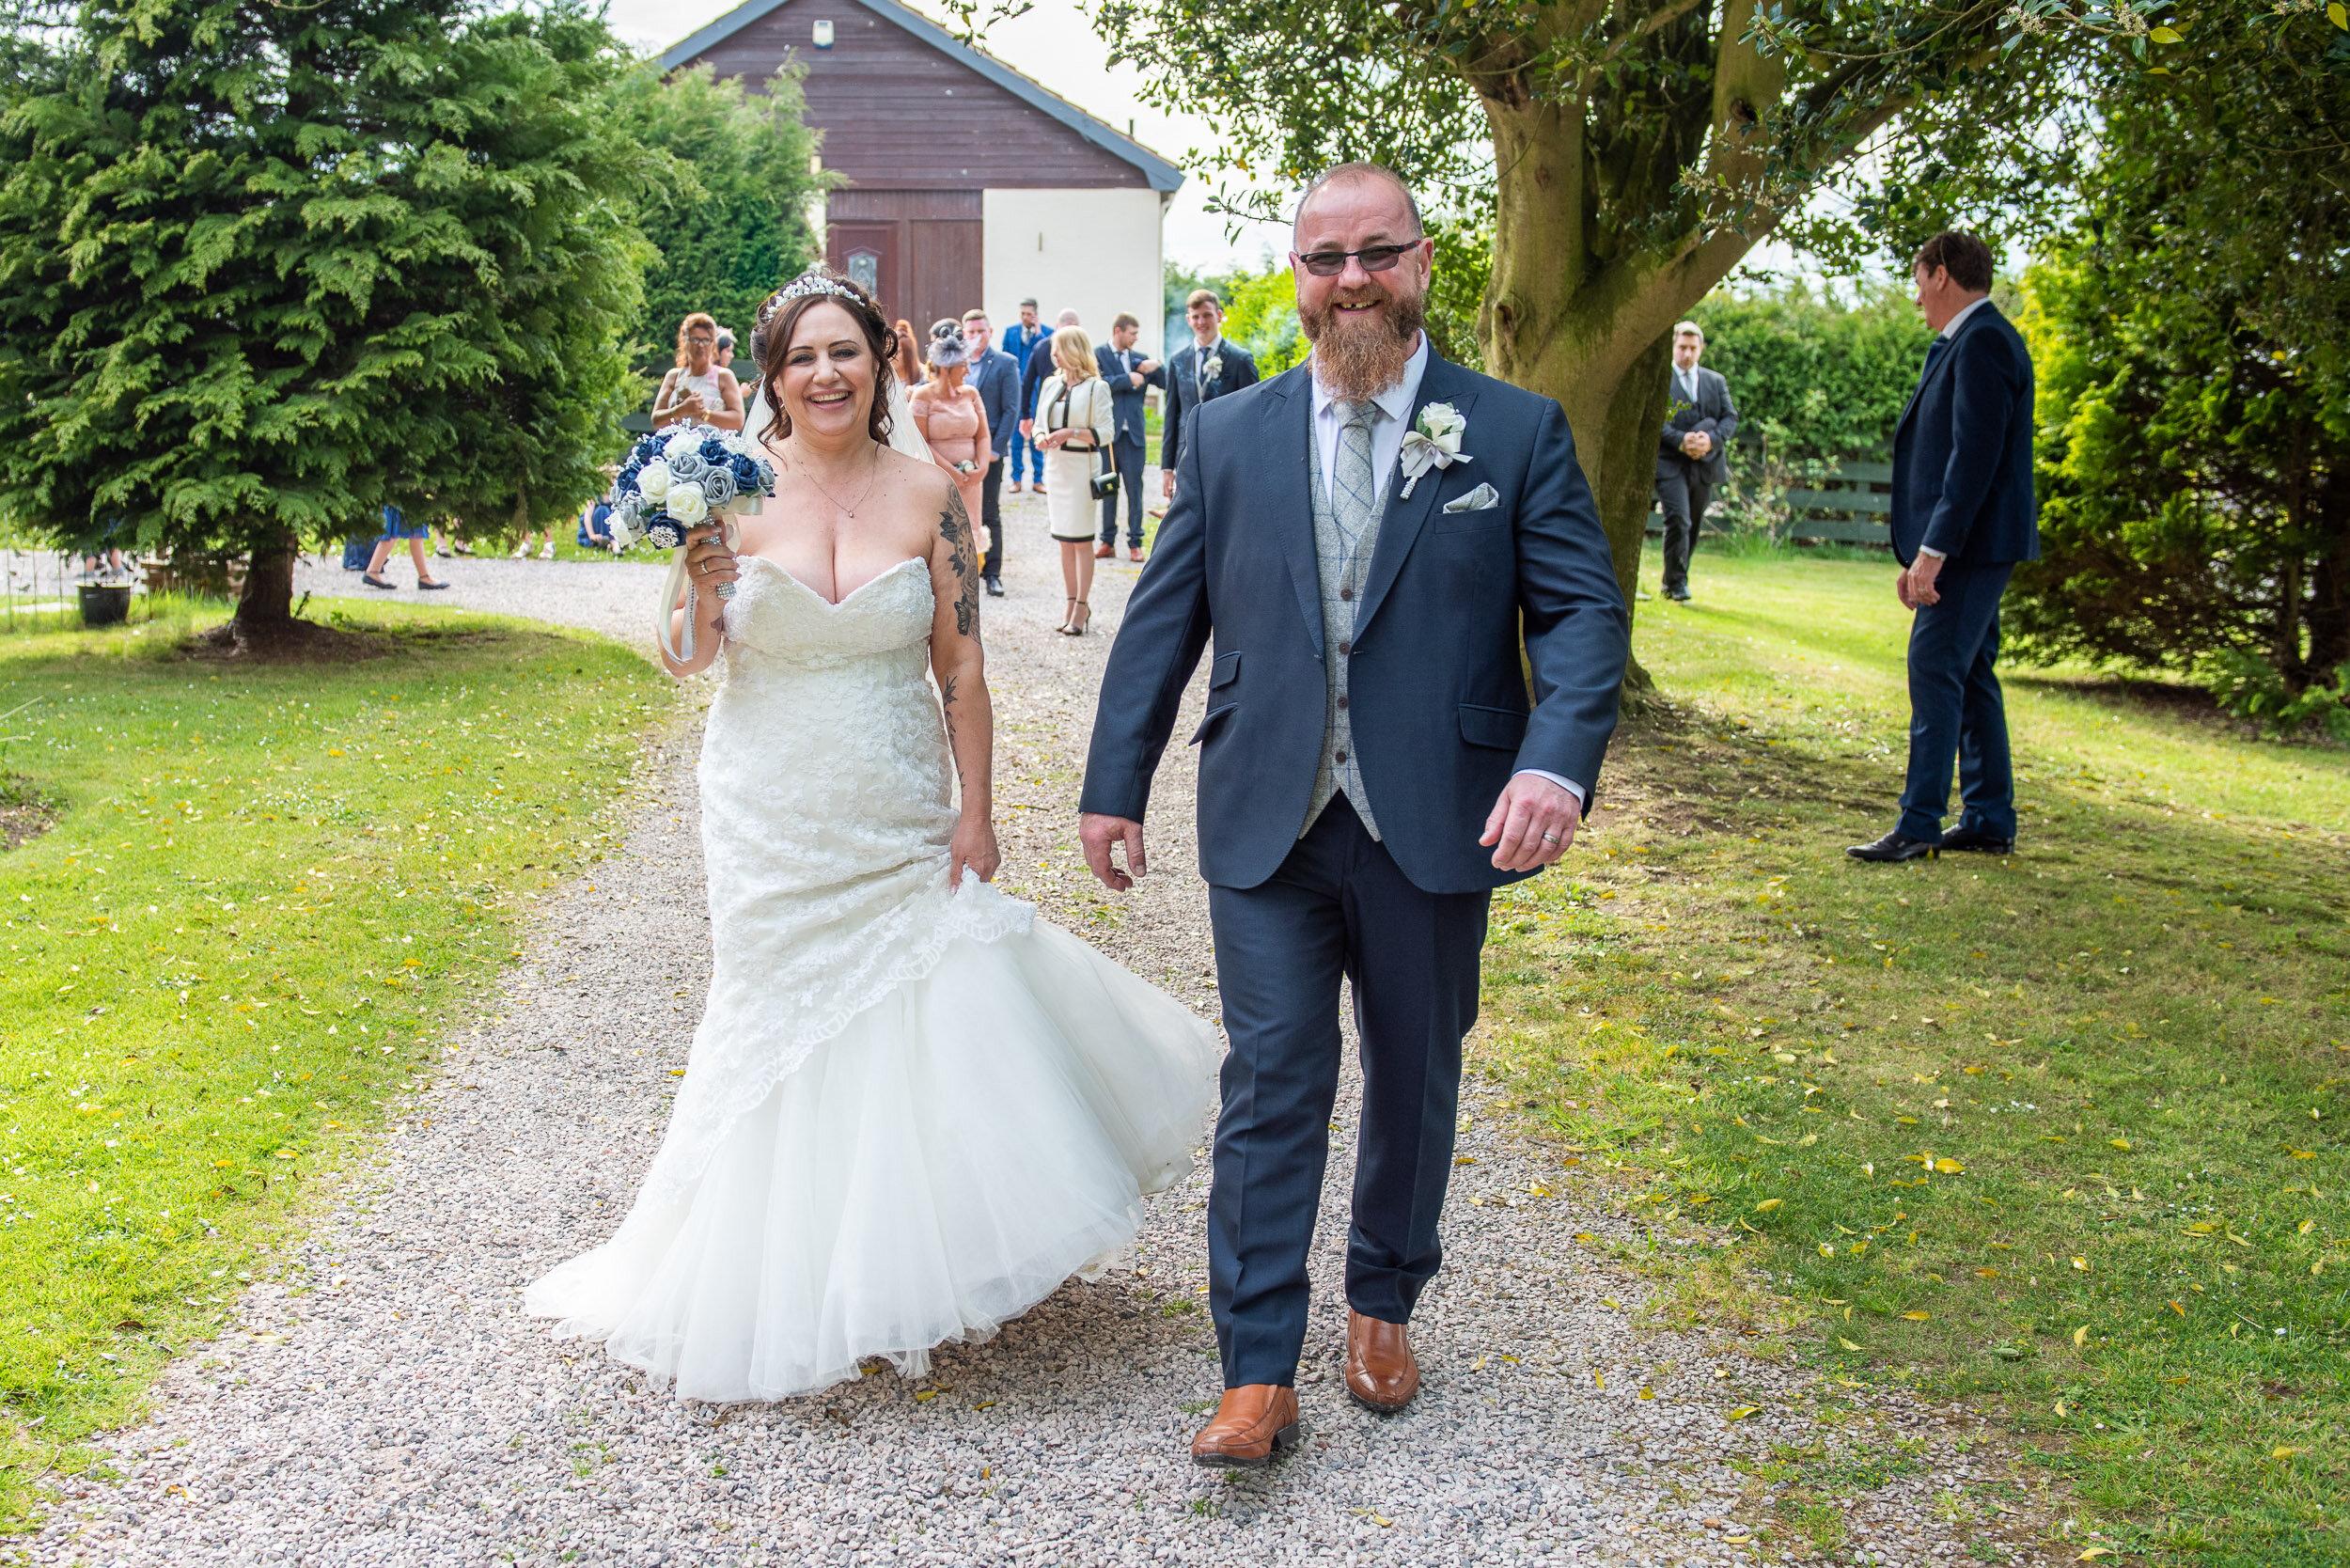 Heaton_wedding_photos_Gretna-8.jpg